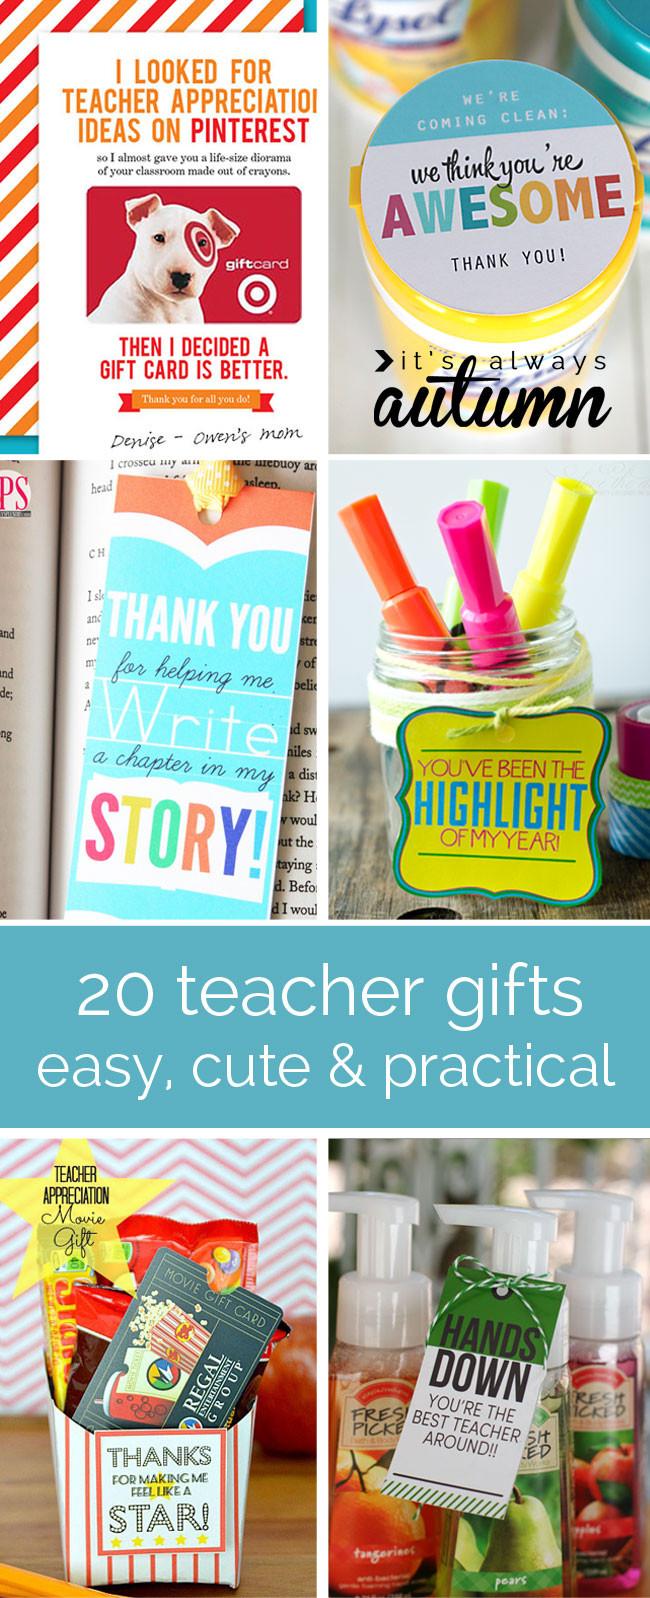 Best ideas about Teachers Appreciation Gift Ideas . Save or Pin 20 cheap easy cute & practical teacher appreciation Now.